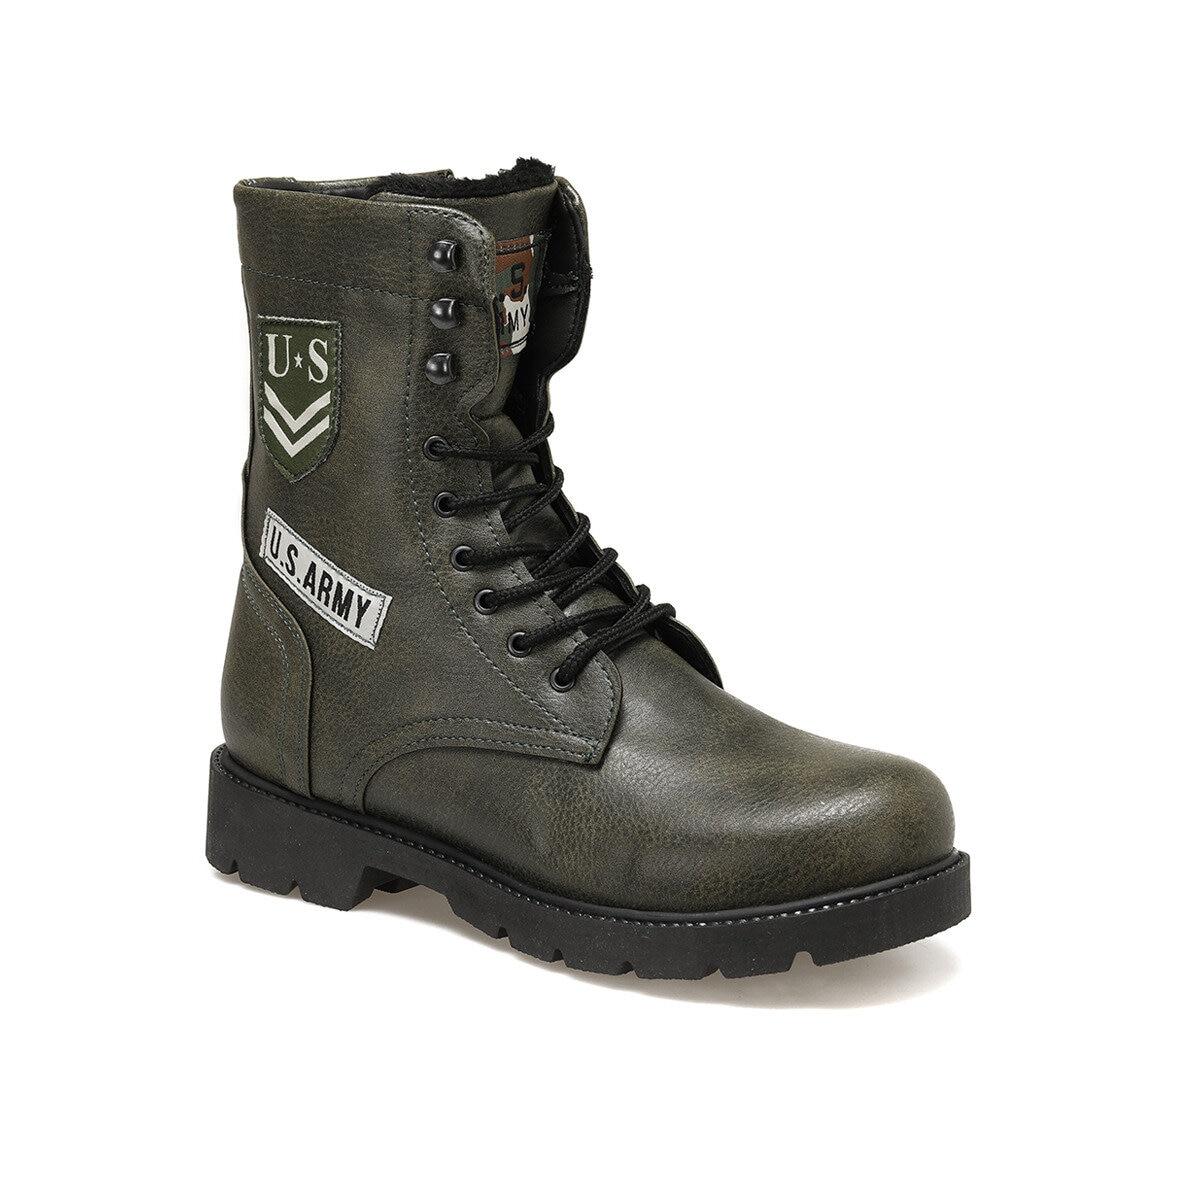 FLO EC-1002 Khaki Male Boots Forester